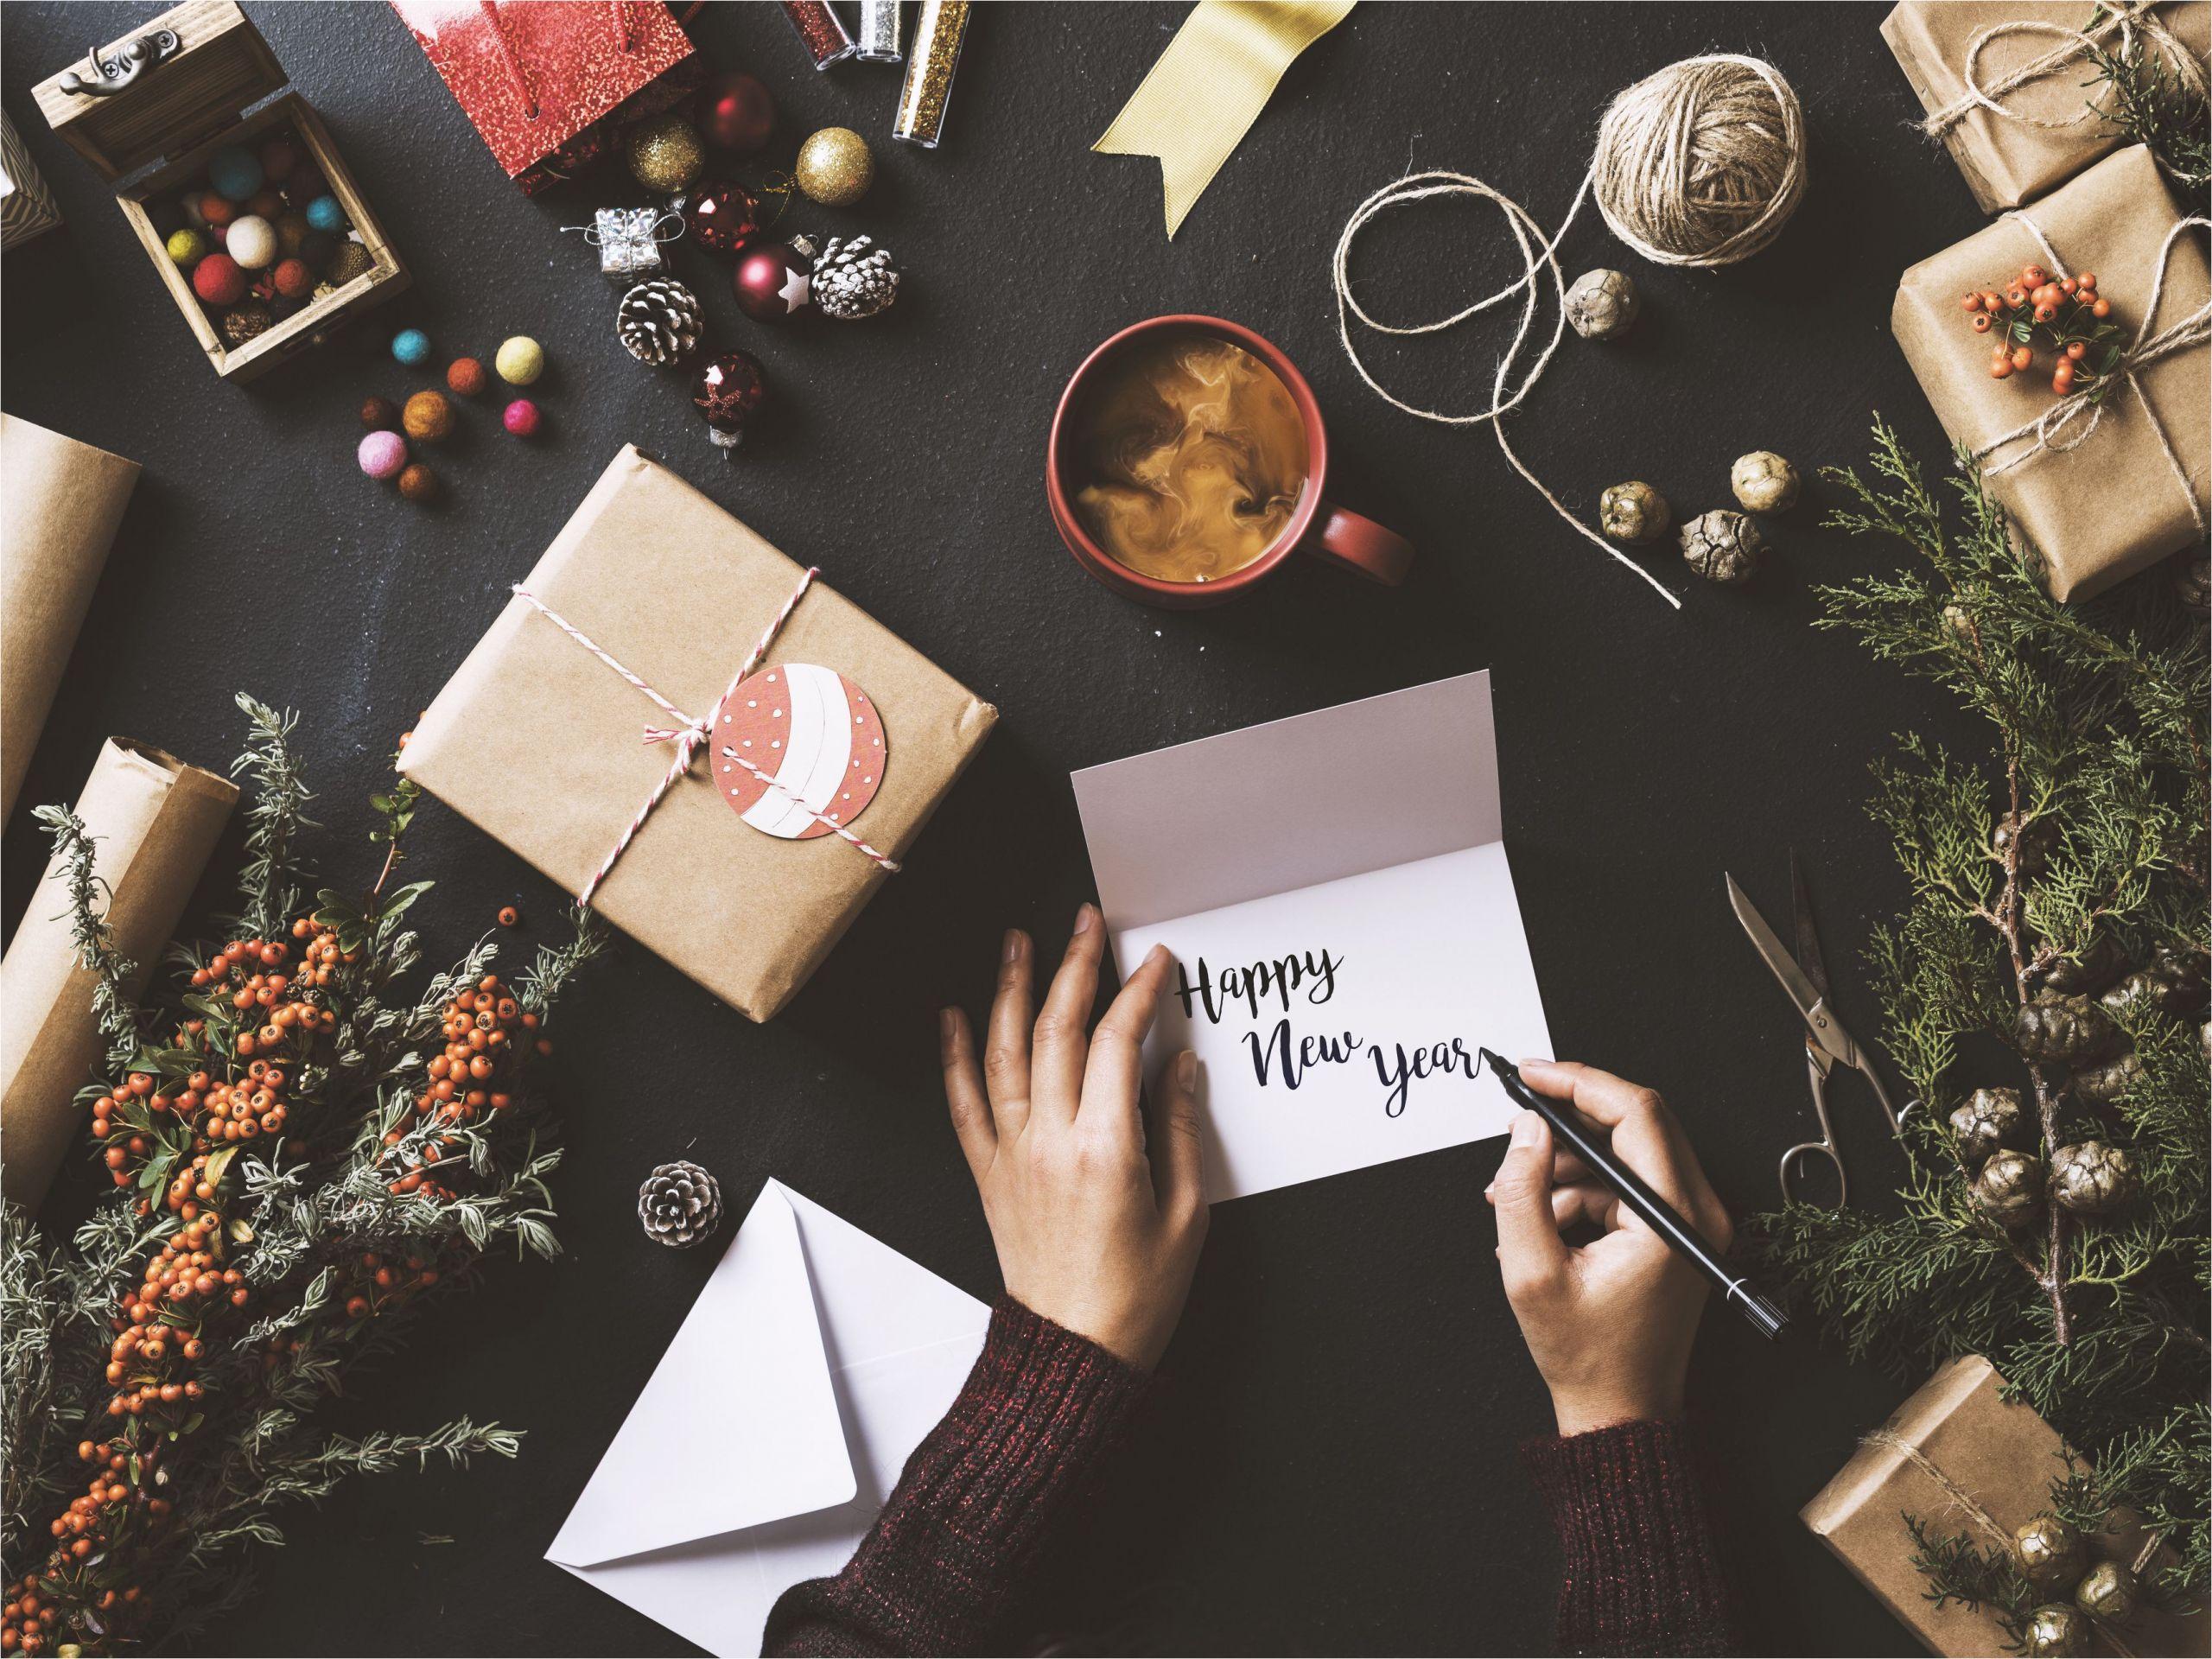 writing new year cards table top flat lay 628016248 5bde516046e0fb00268d5ddb jpg